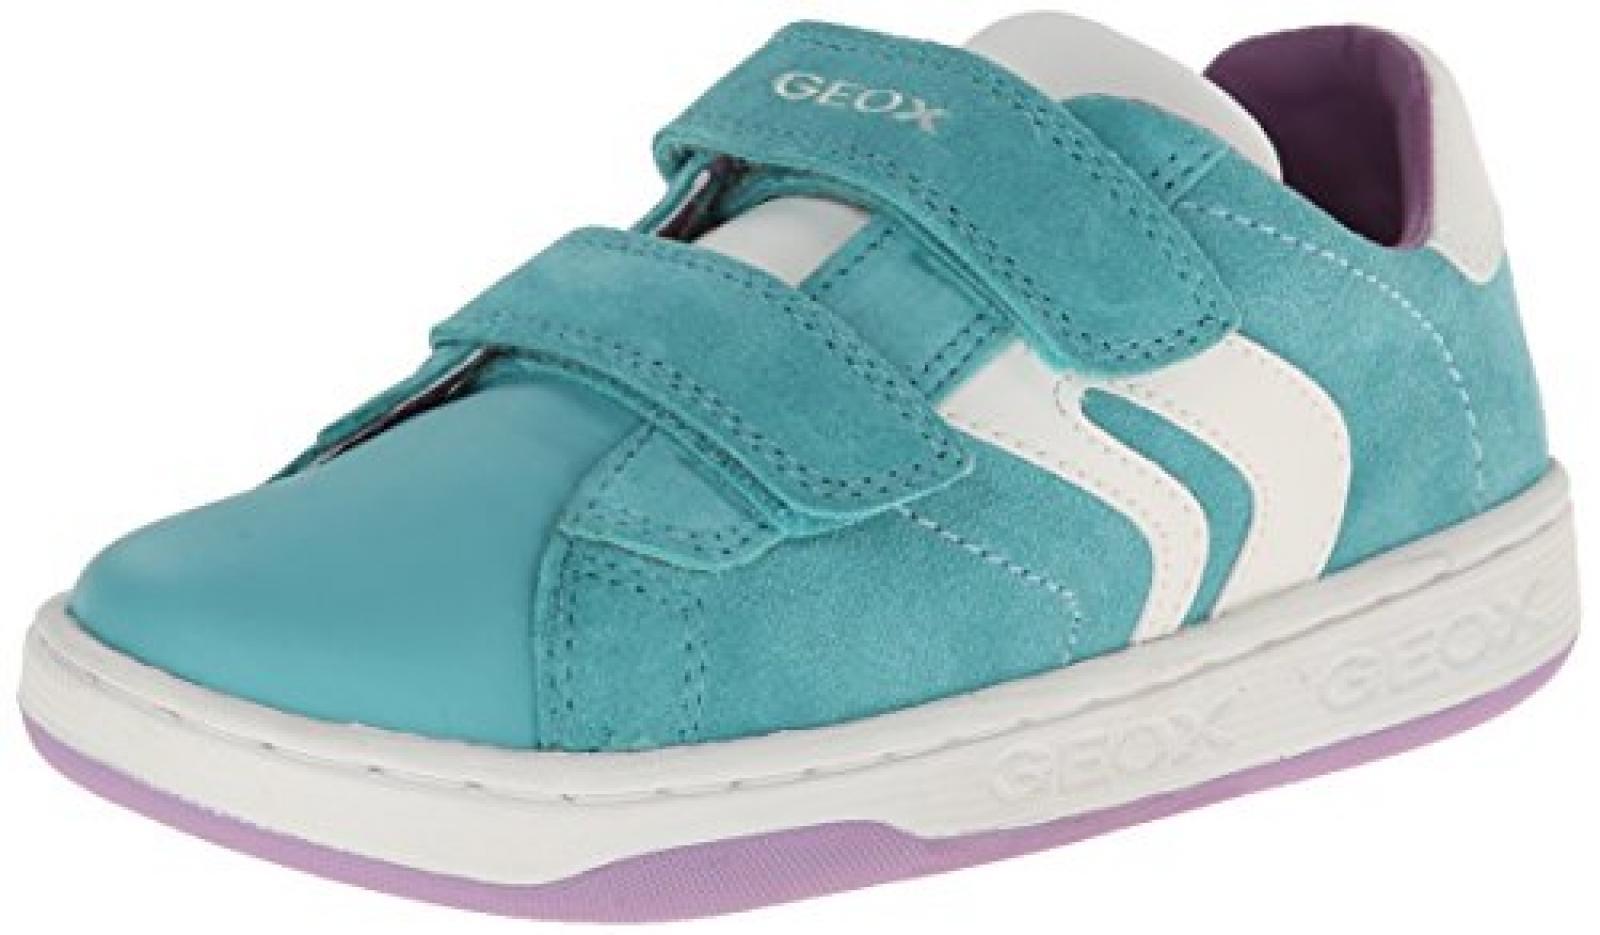 Geox JR MALTIN A Mädchen Sneakers